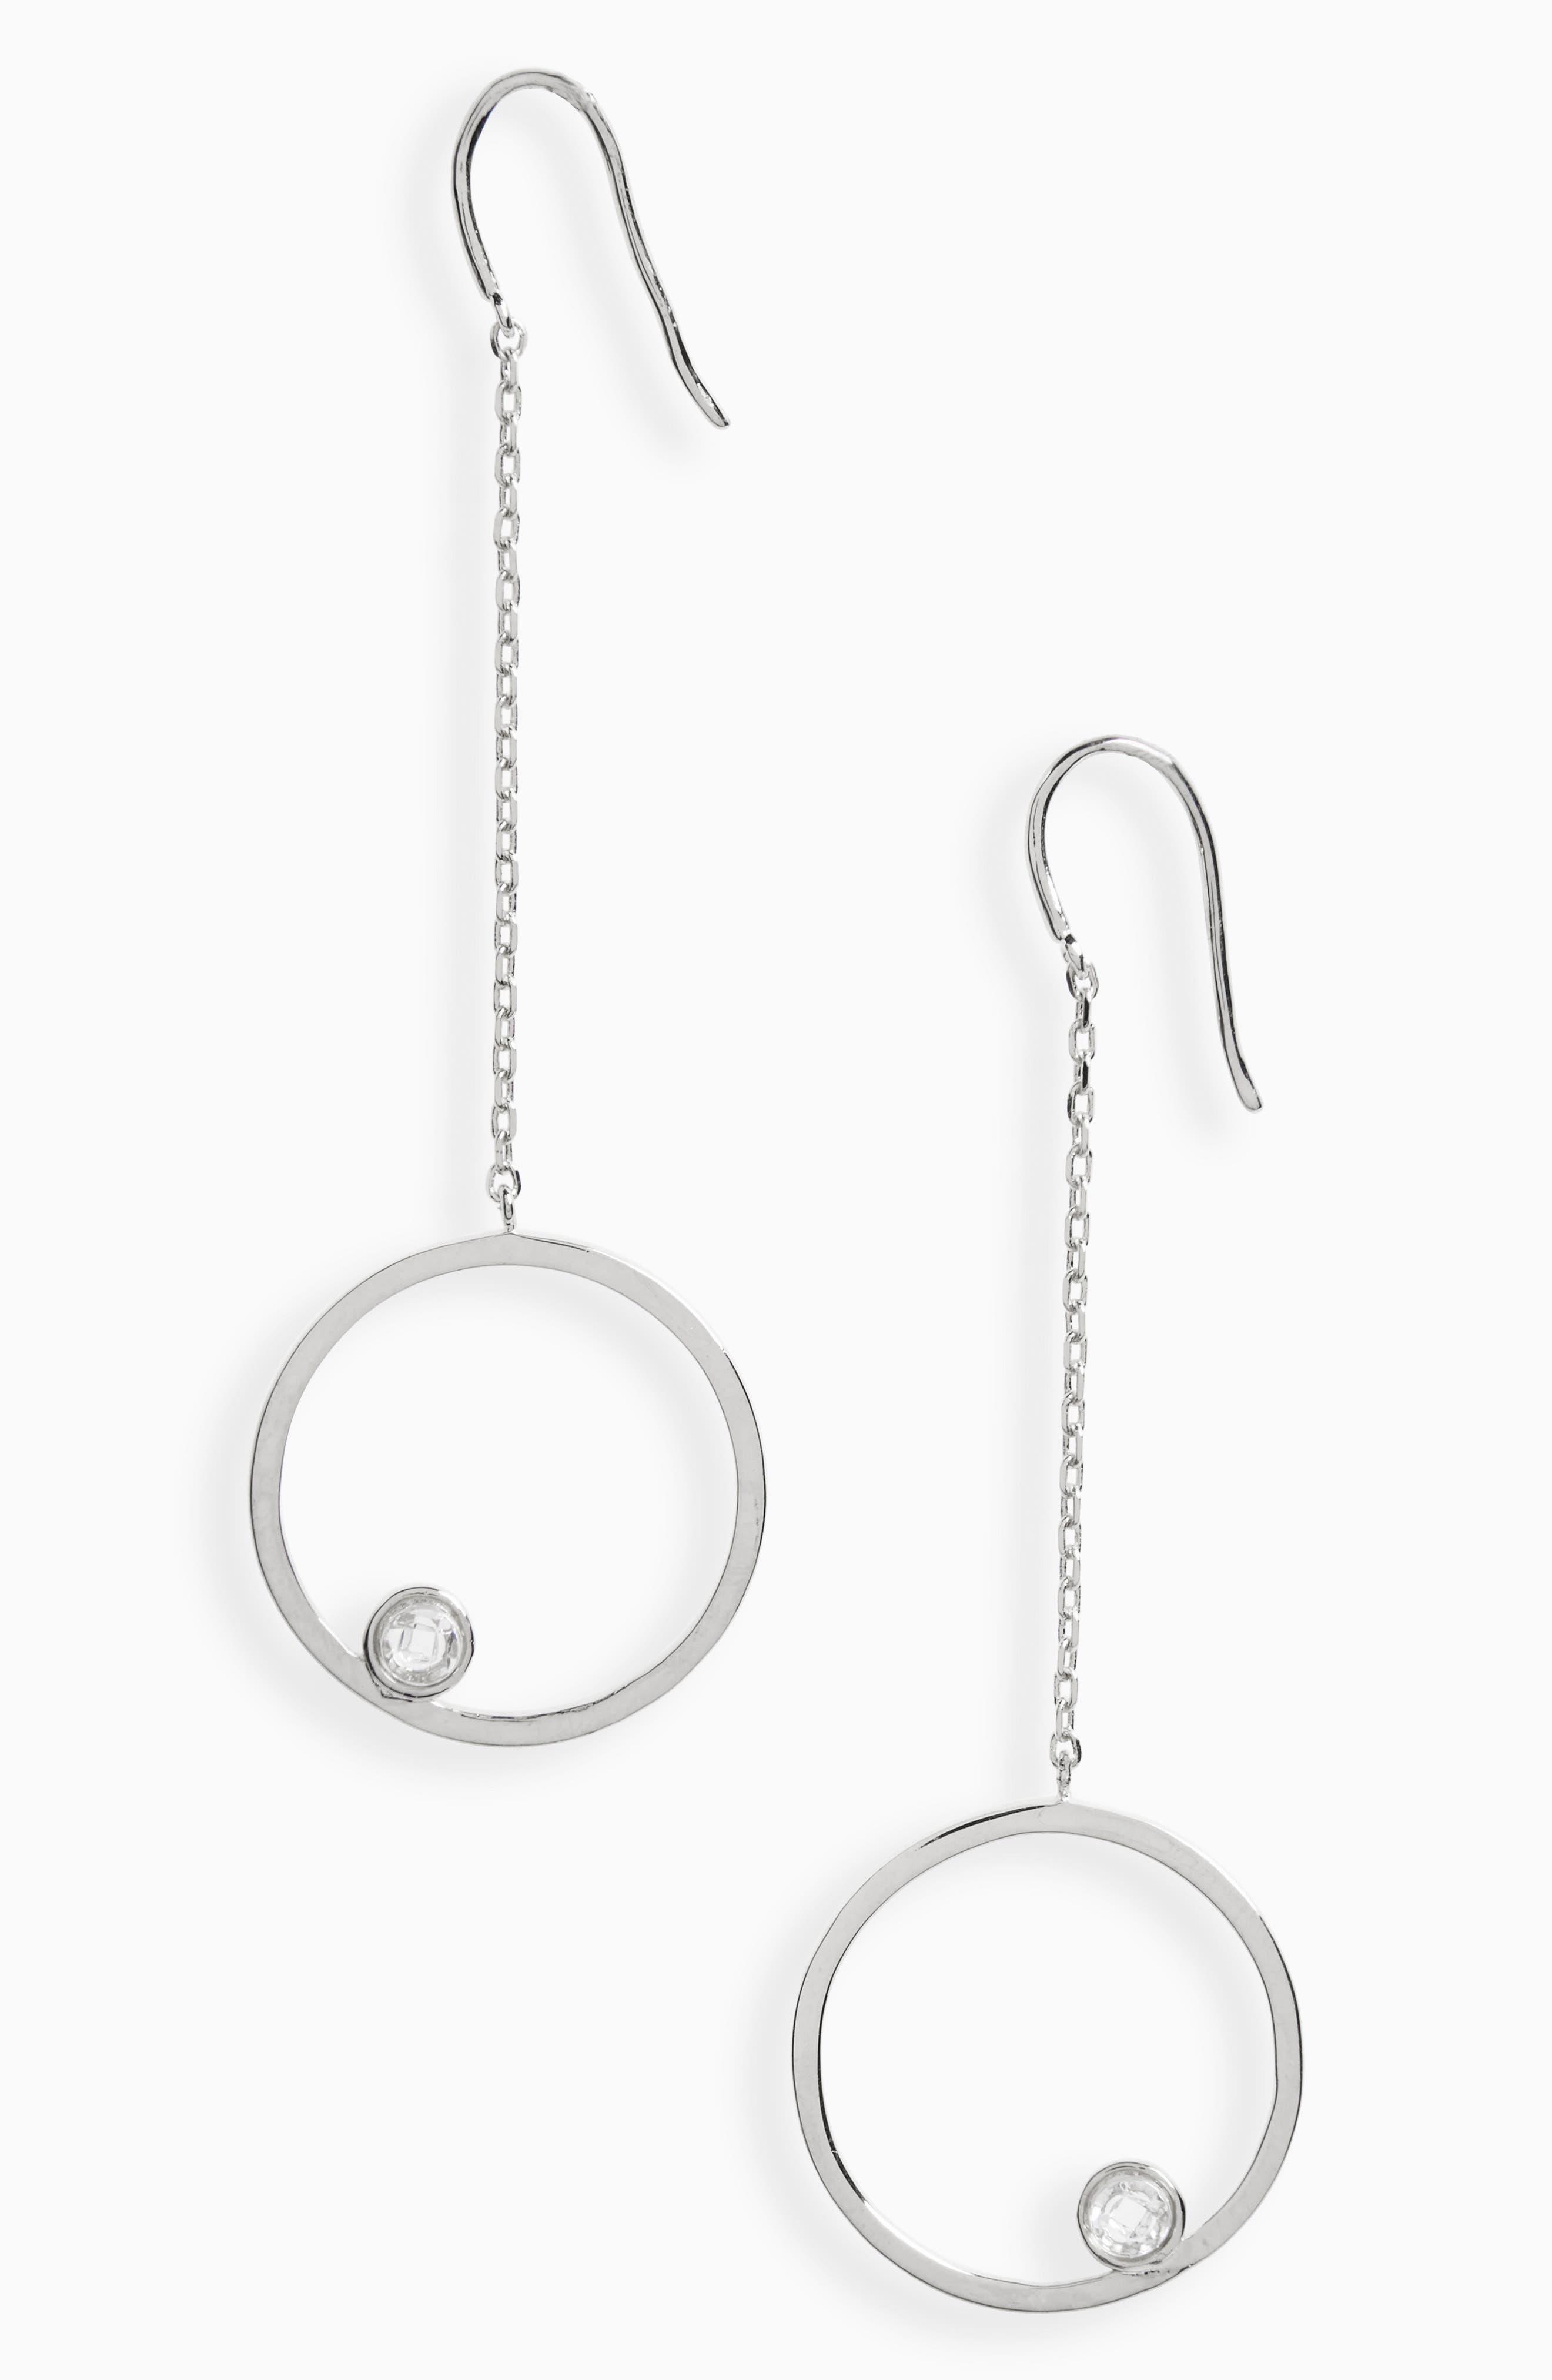 Kelly Drop Earrings,                             Main thumbnail 1, color,                             Silver